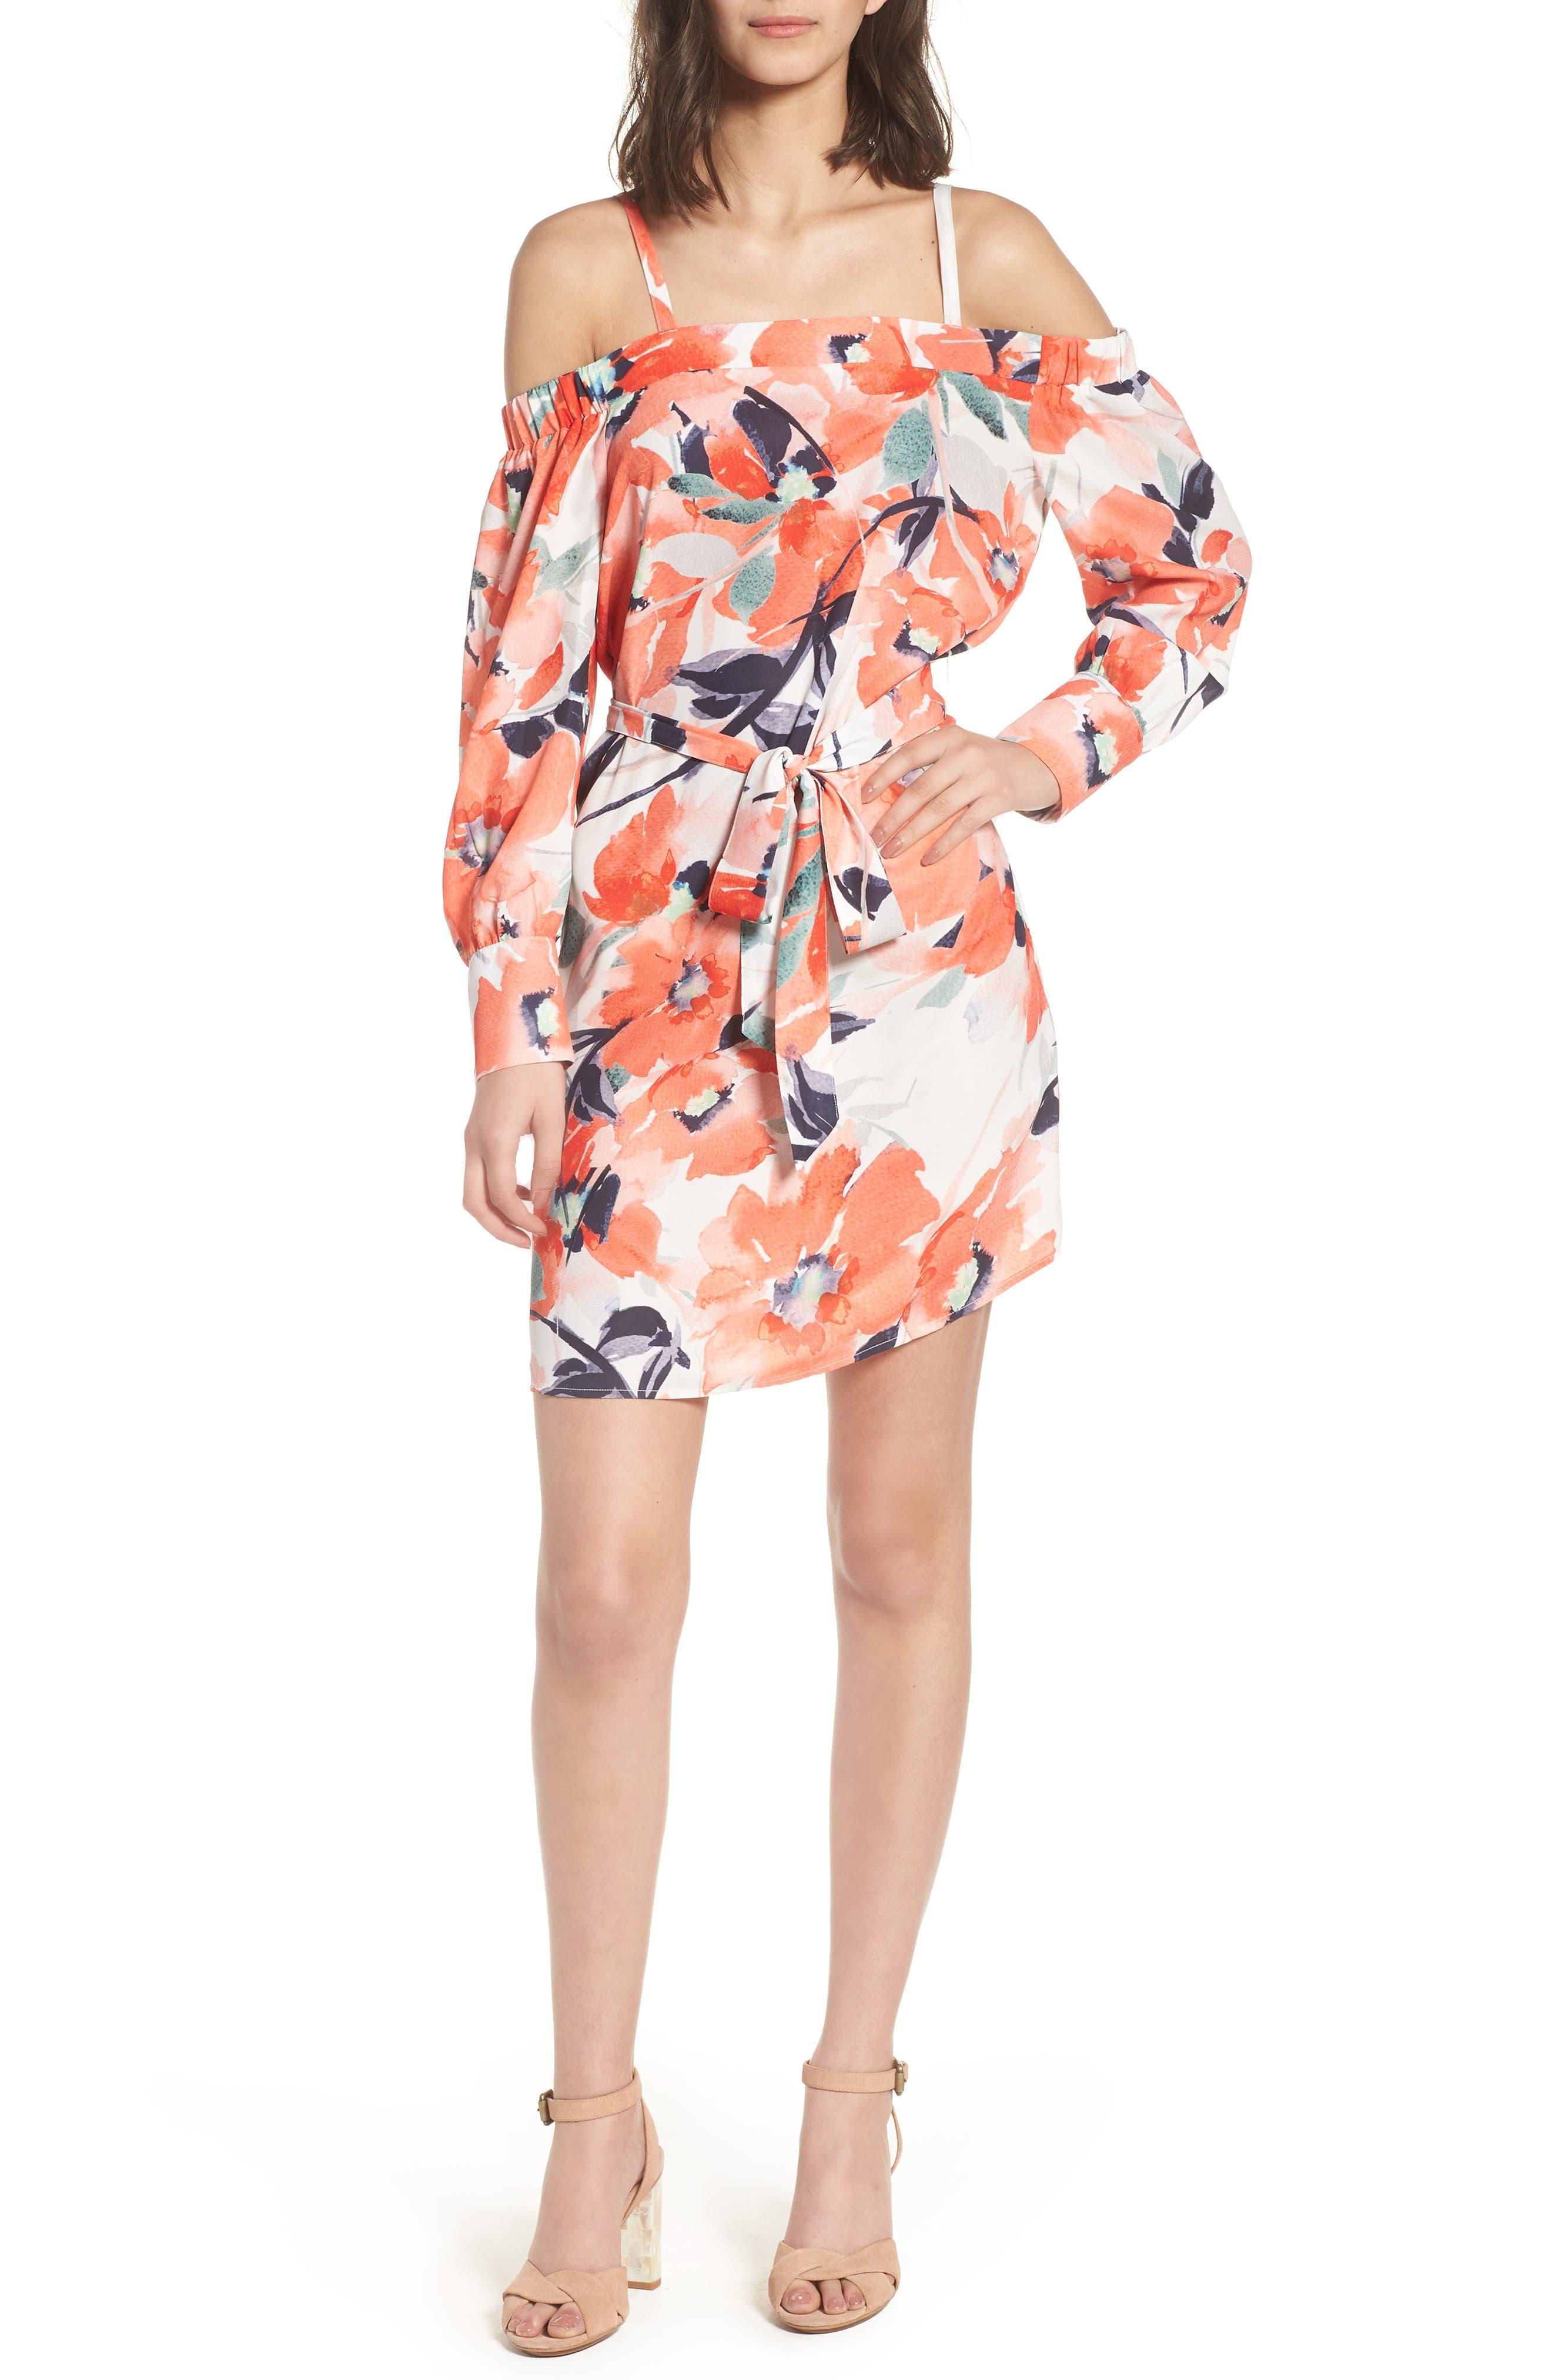 Bishop + Young Chrissy Cold Shoulder Dress,                             Main thumbnail 1, color,                             600